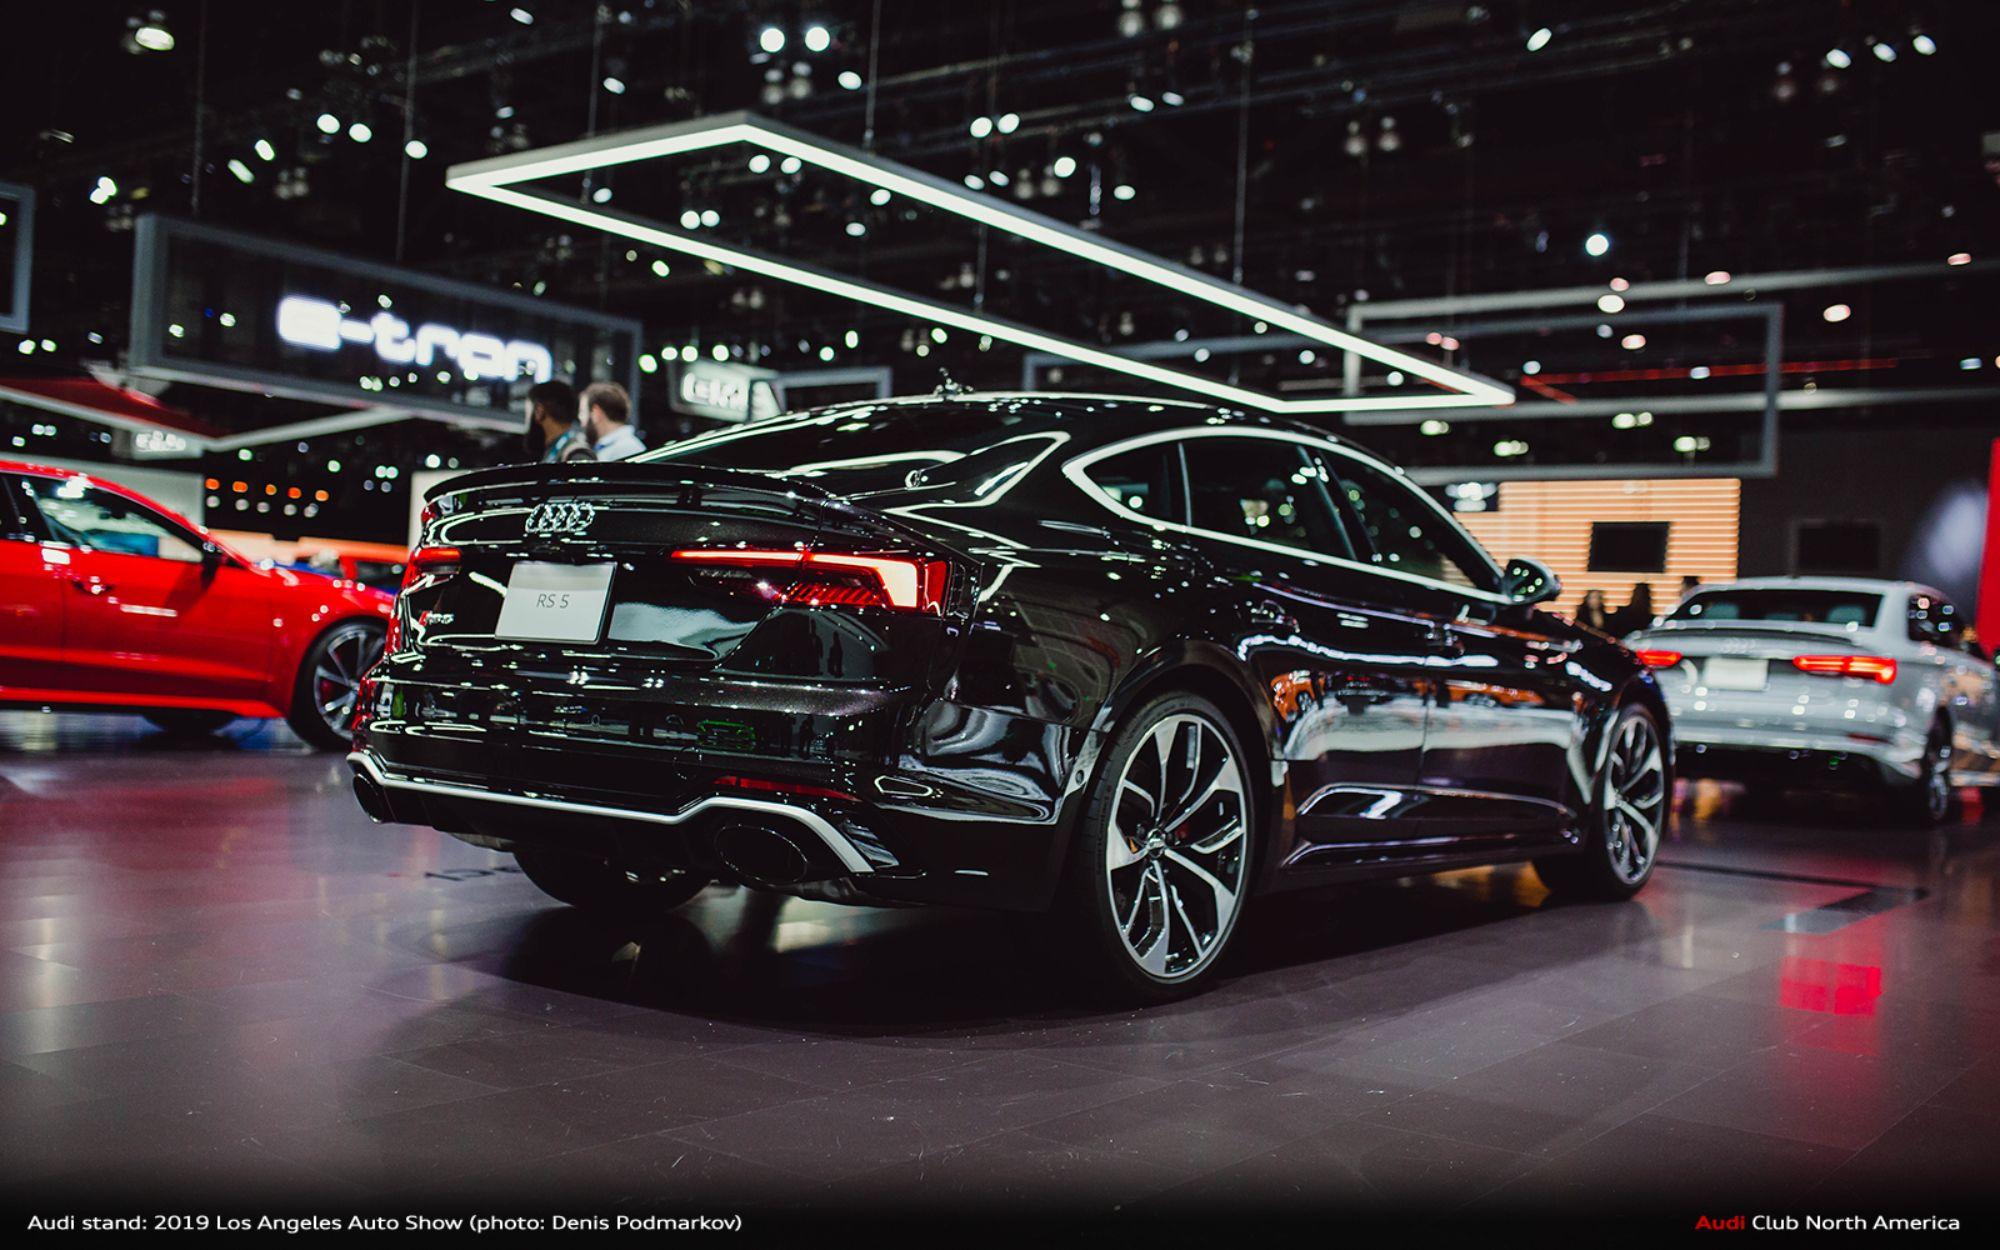 2020 Los Angeles Auto Show.Event Los Angeles Auto Show 2019 Audi Club North America